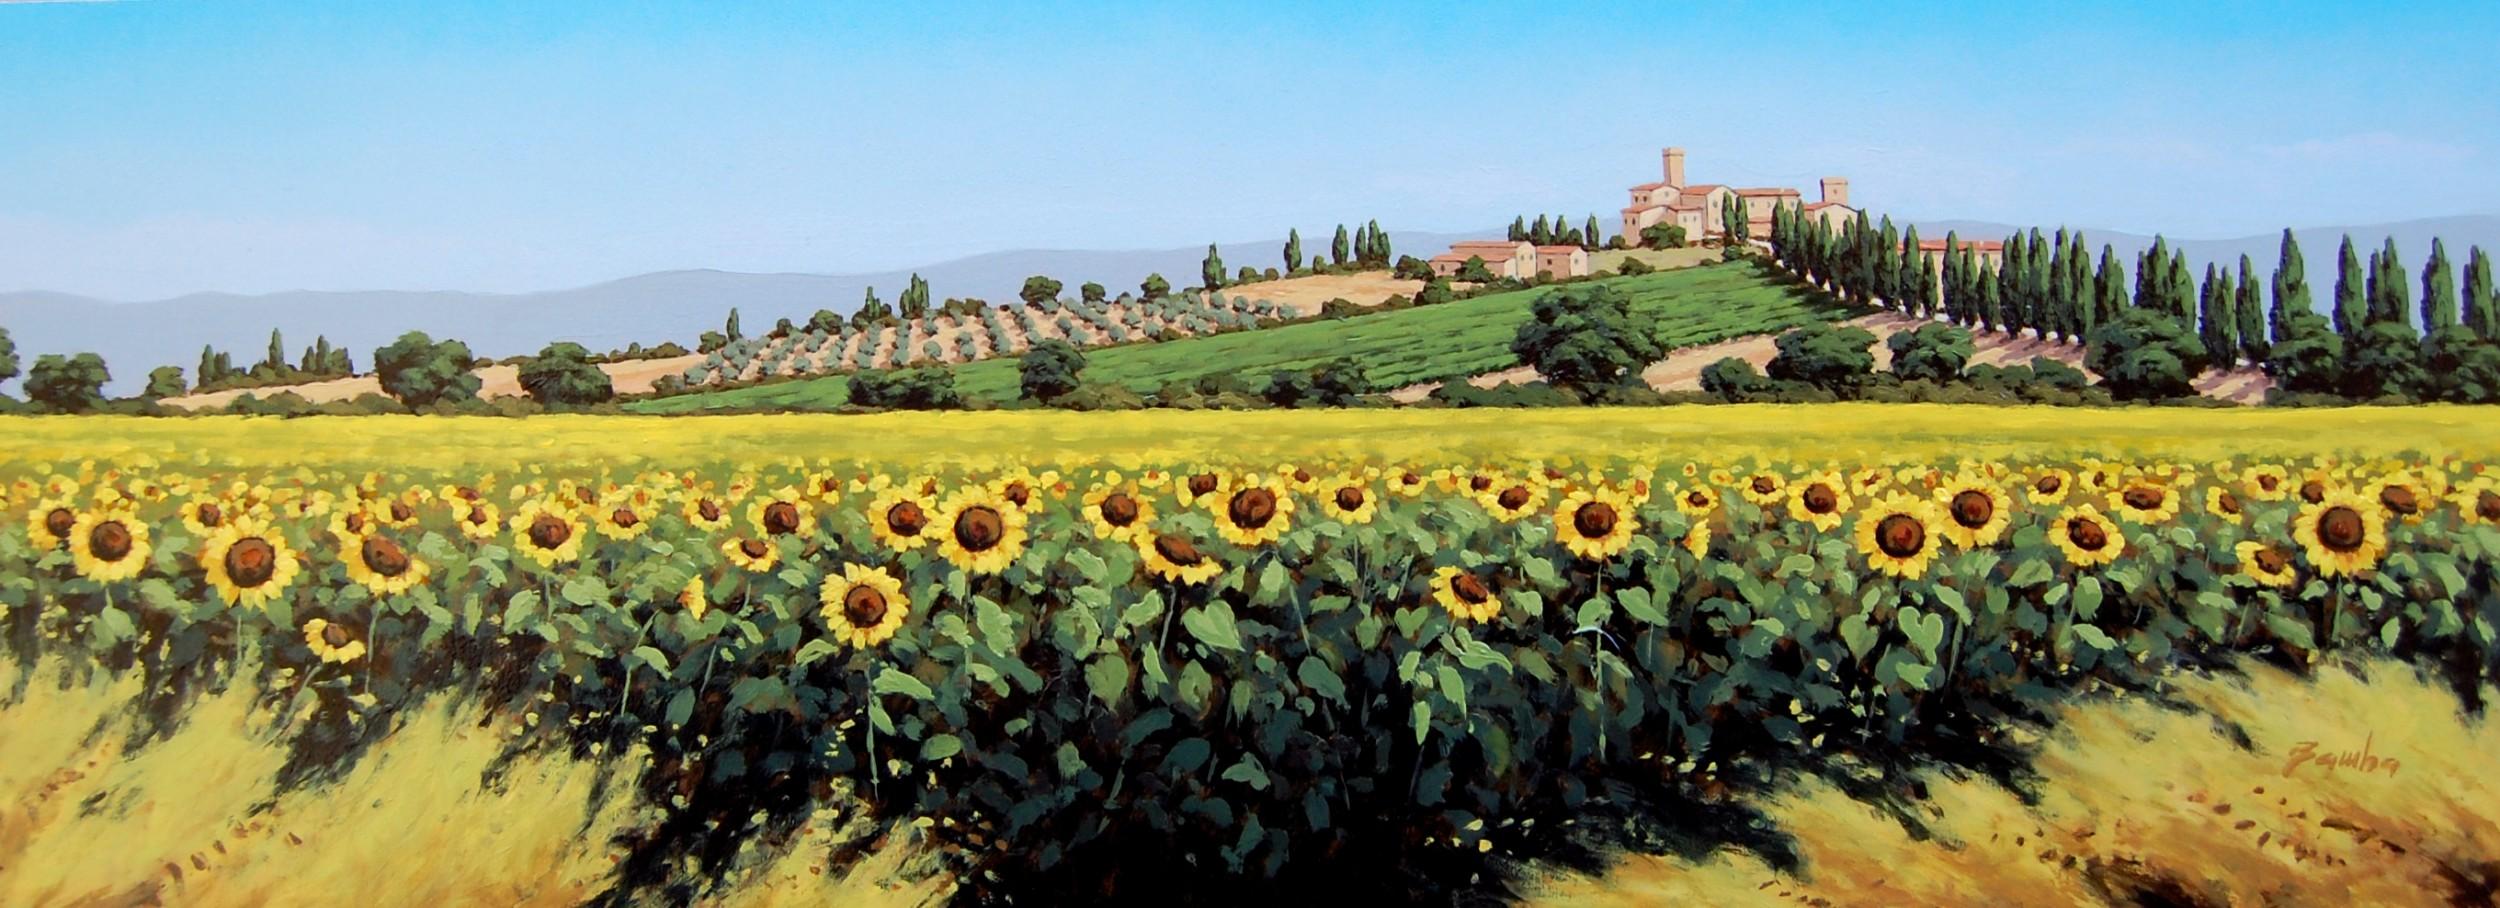 Girasoli in Toscana n. 6 - Bamba - Opera Celeste Network